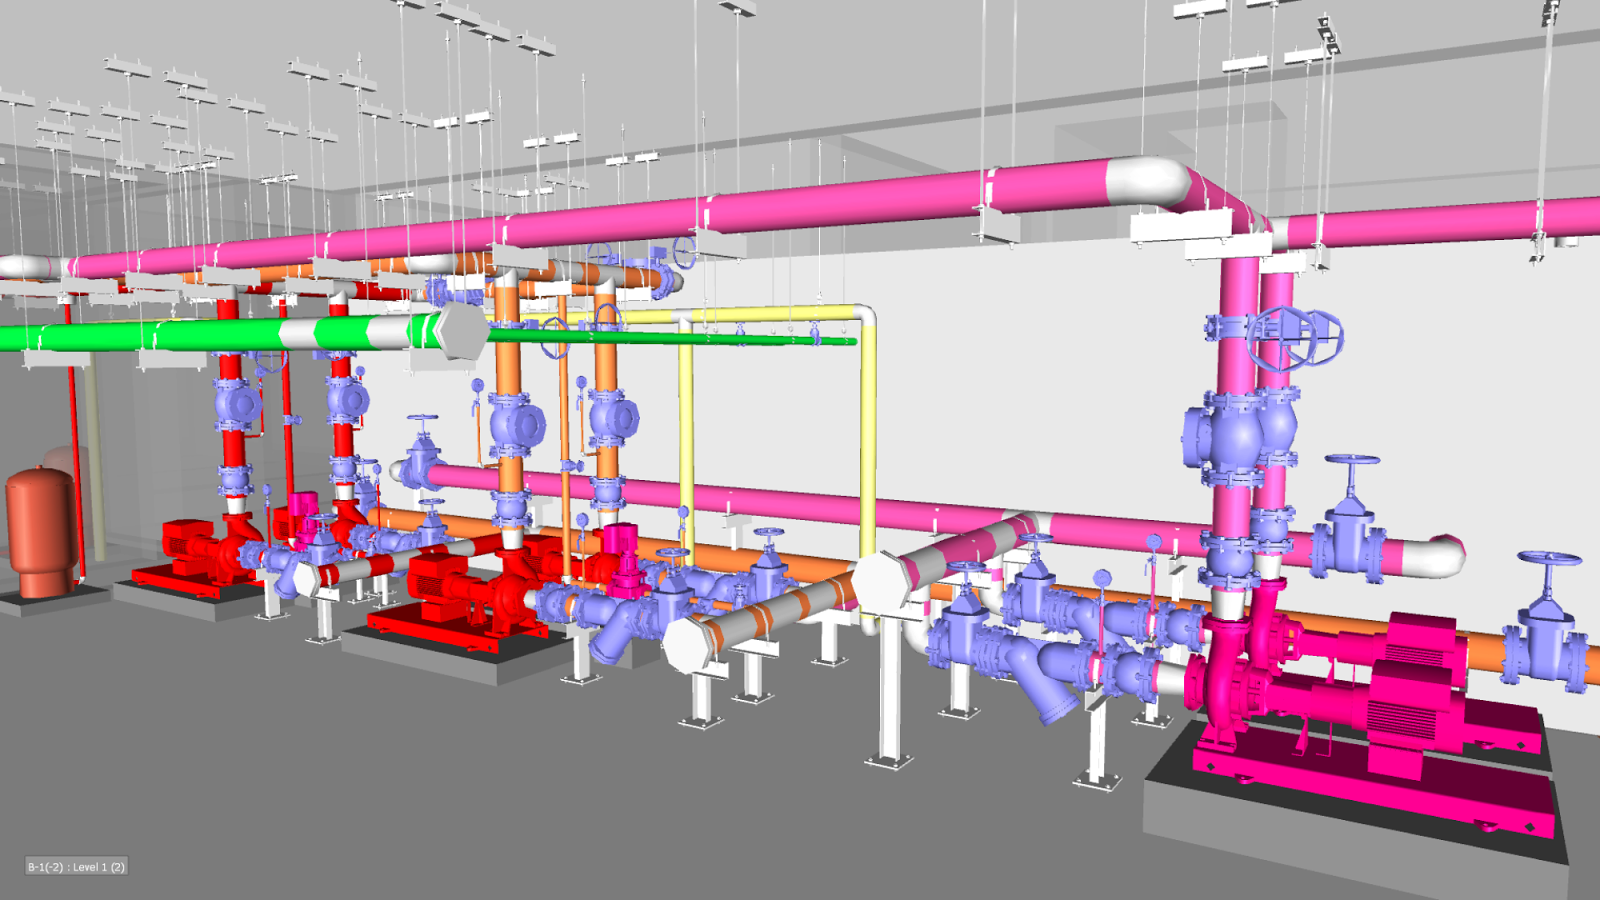 medium resolution of download also fire pump room revit mep drawings